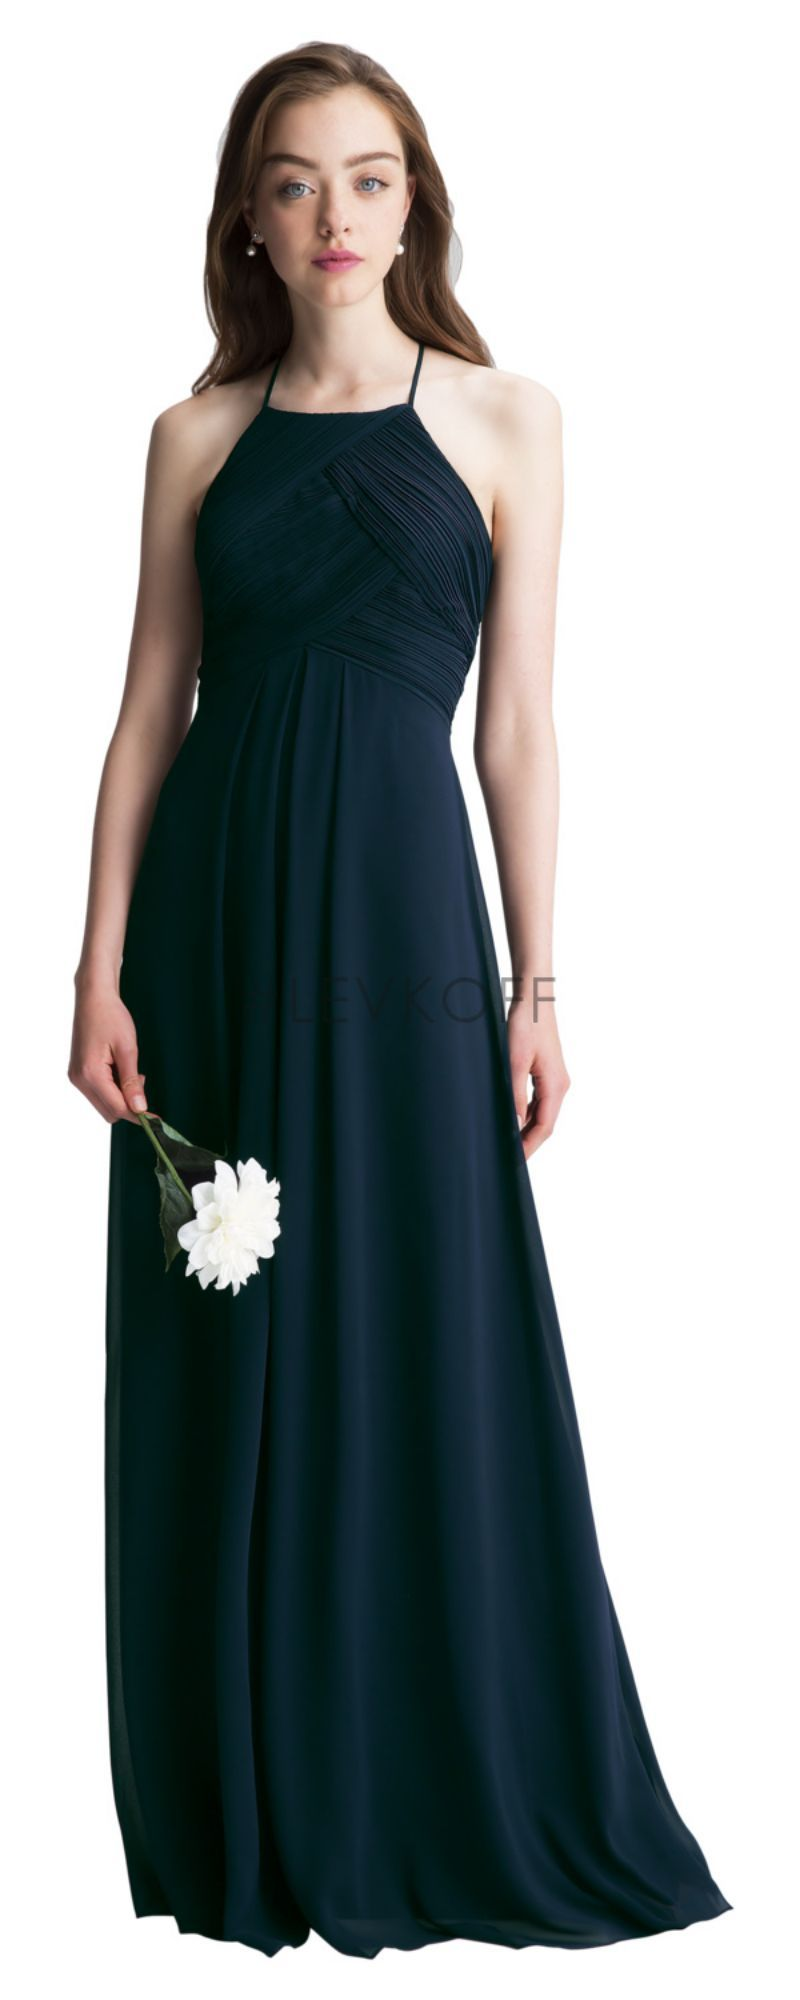 Bill levkoff bridesmaid dresses levkoff 7001bill levkoff bill levkoff bridesmaid dresses levkoff 7001bill levkoff bridesmaidsvintage bridesmaid ombrellifo Images